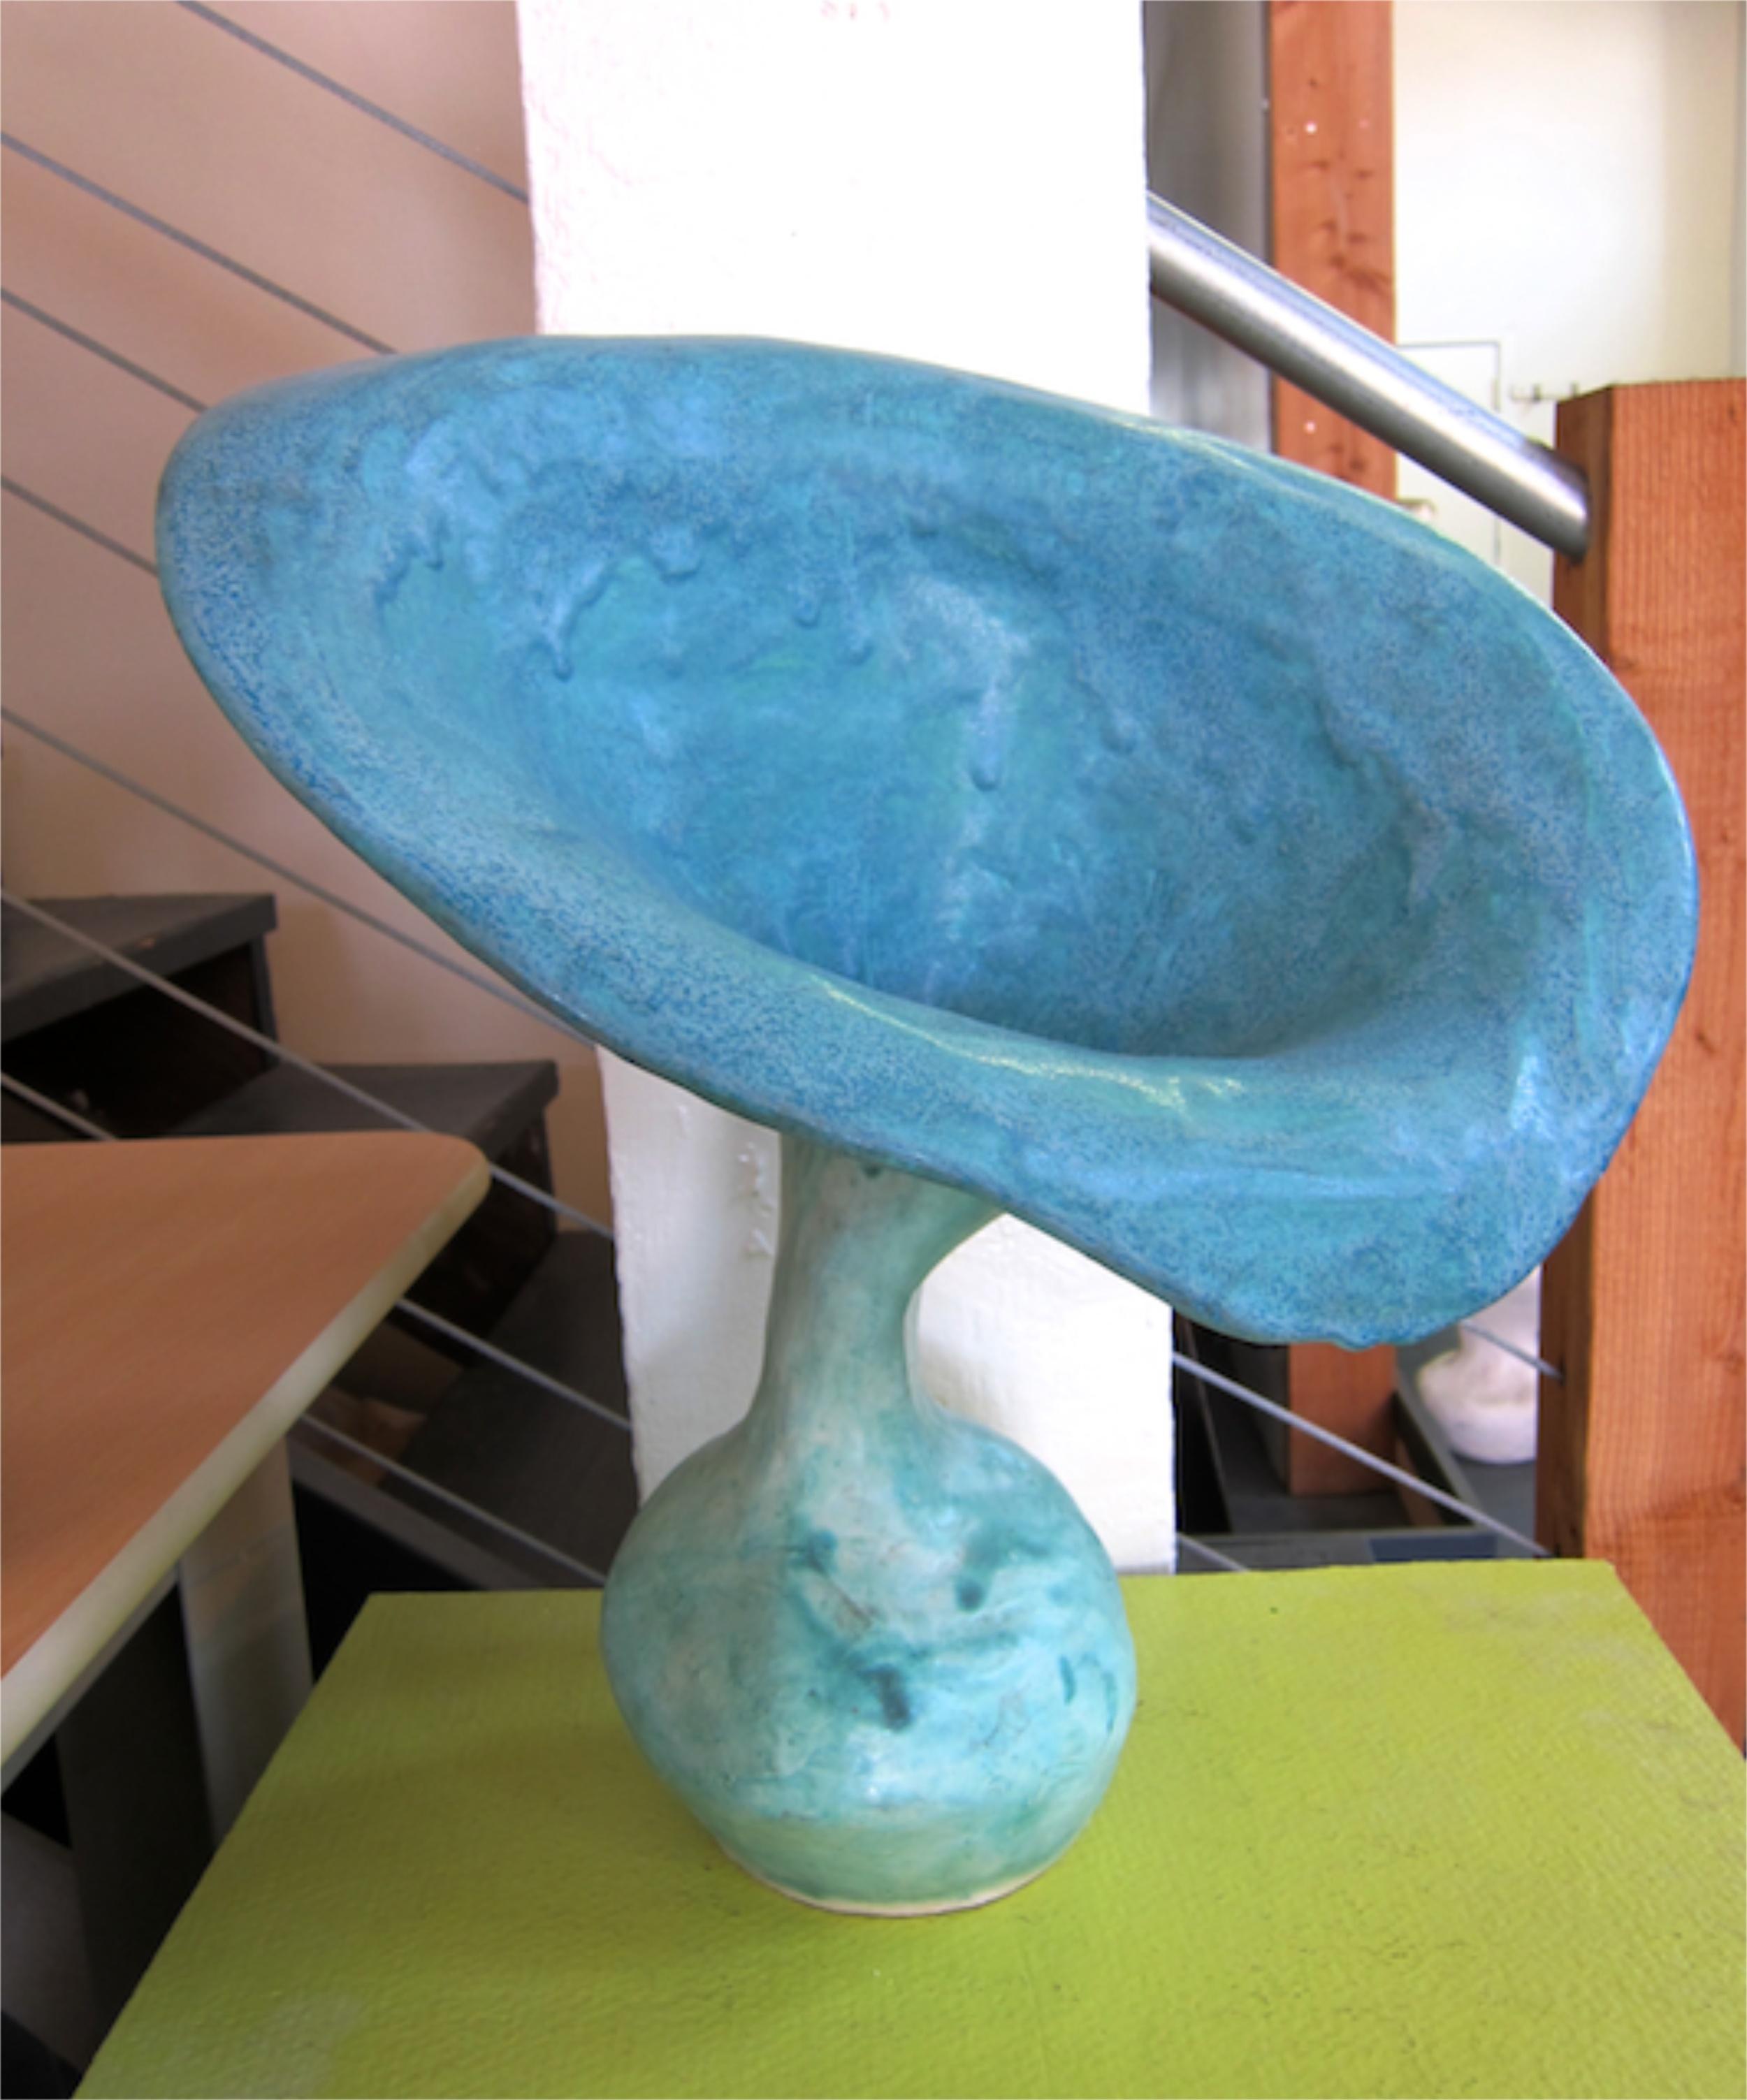 Trumpet sculpture